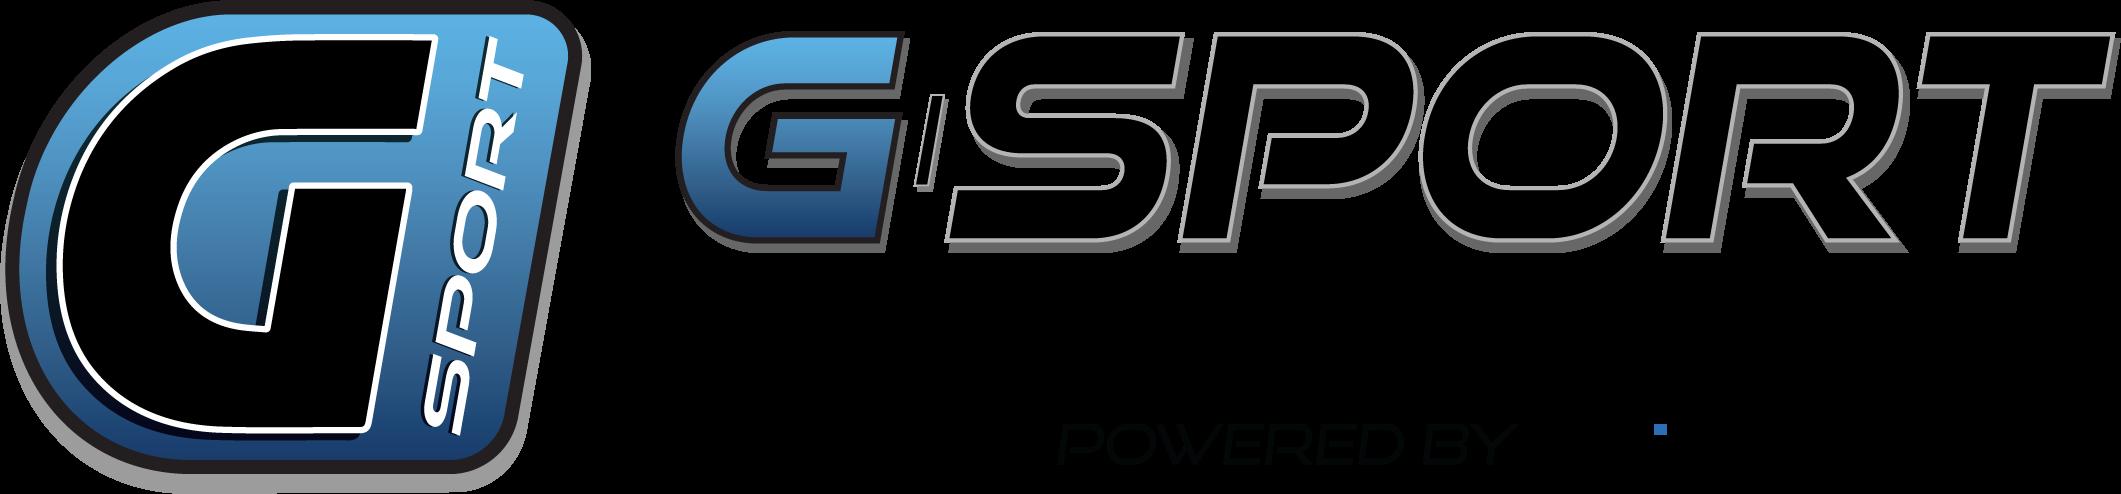 gesi-gsport-logo-blue-h.png